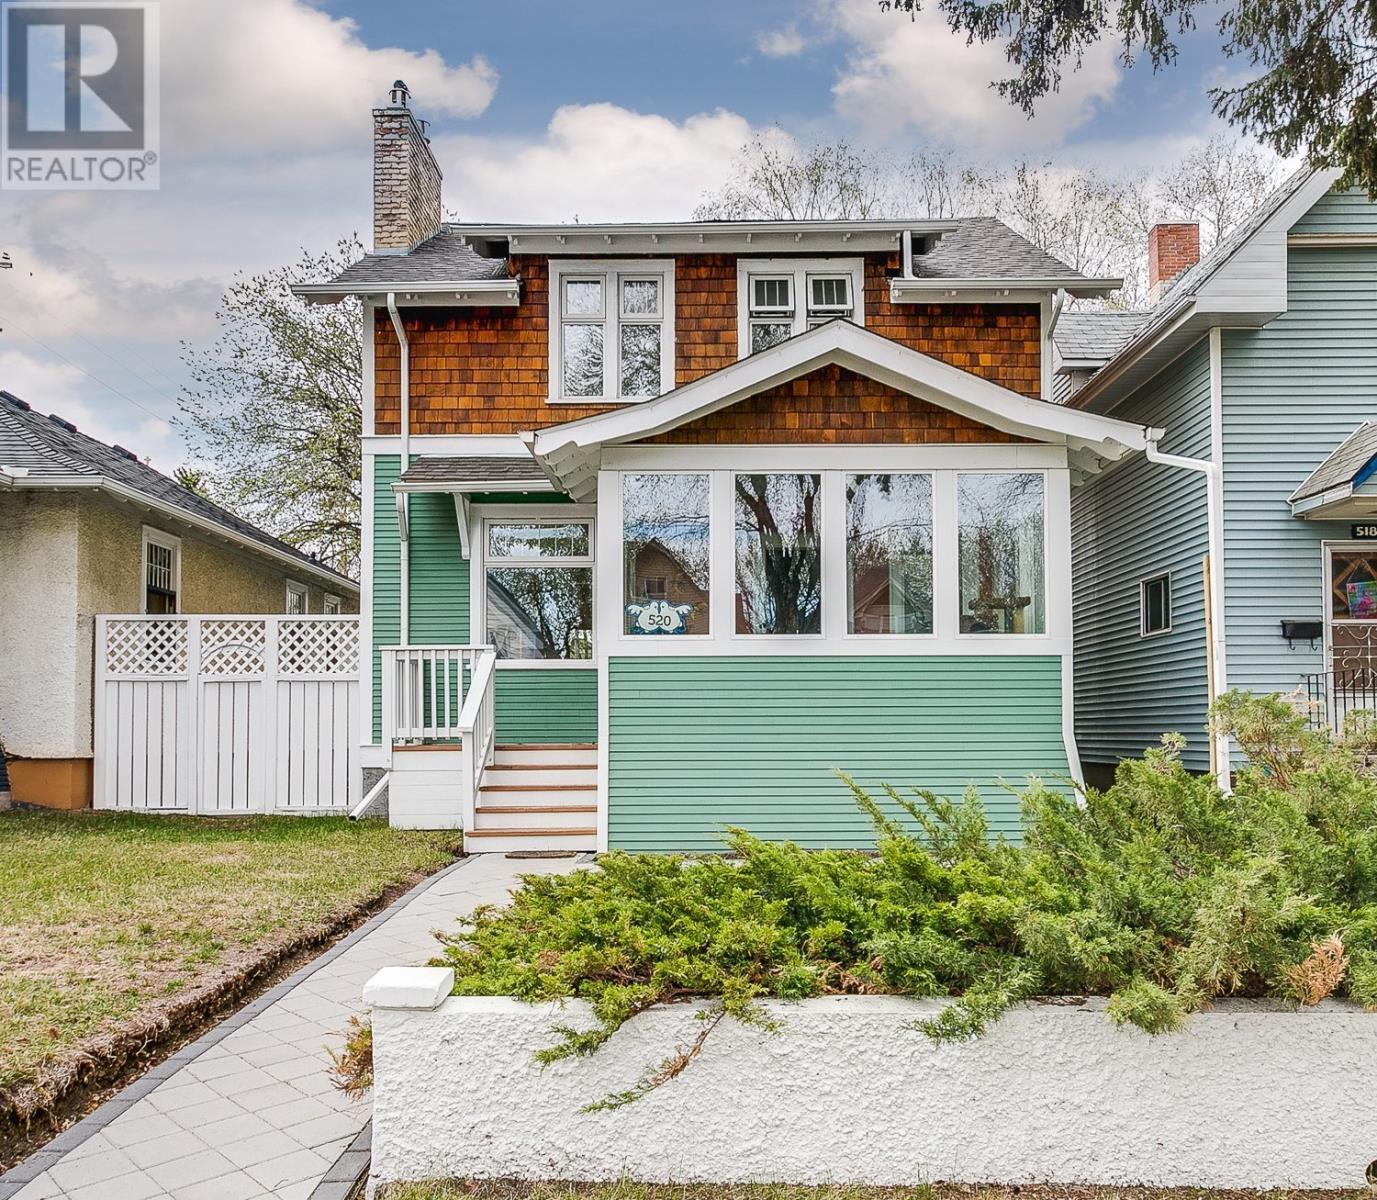 Removed: 520 9th Street East, Saskatoon, SK - Removed on 2019-06-18 06:12:19